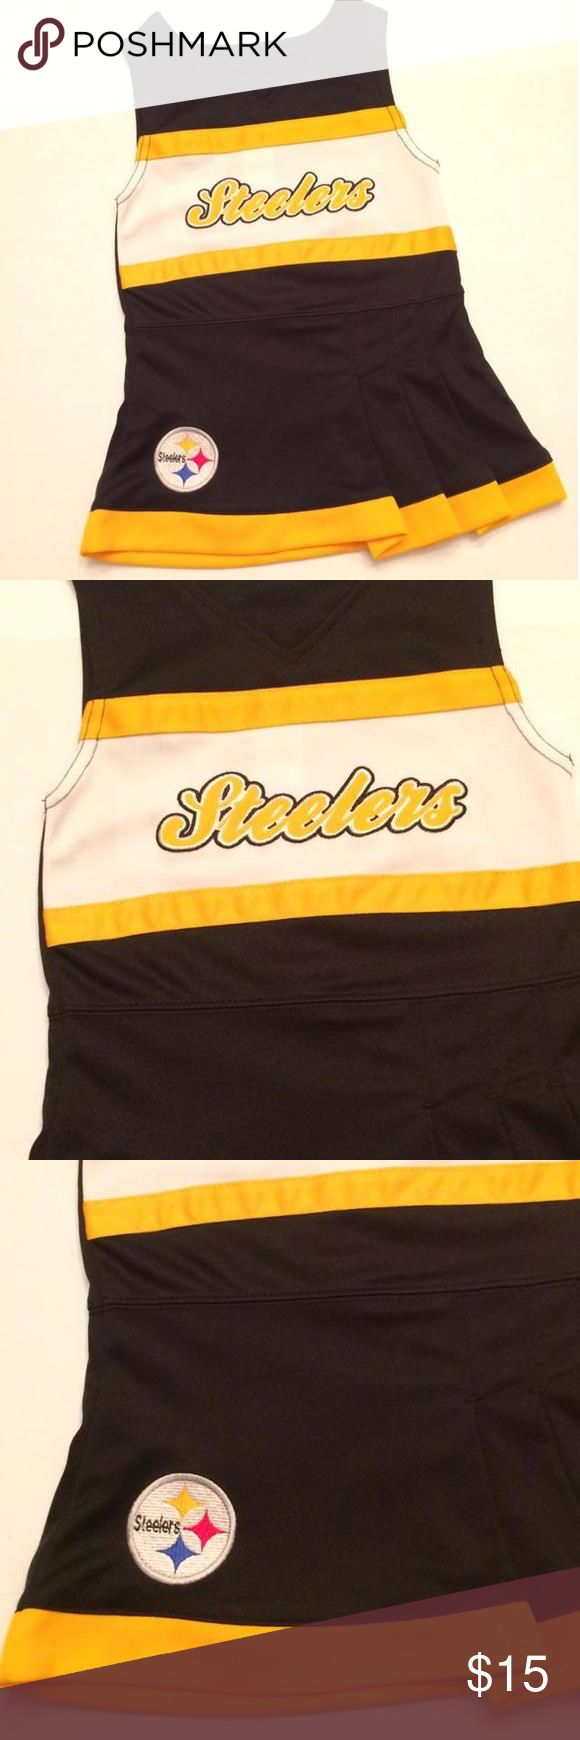 Ponad 1000 pomysłów na temat: Steelers Cheerleaders na Pintereście ...